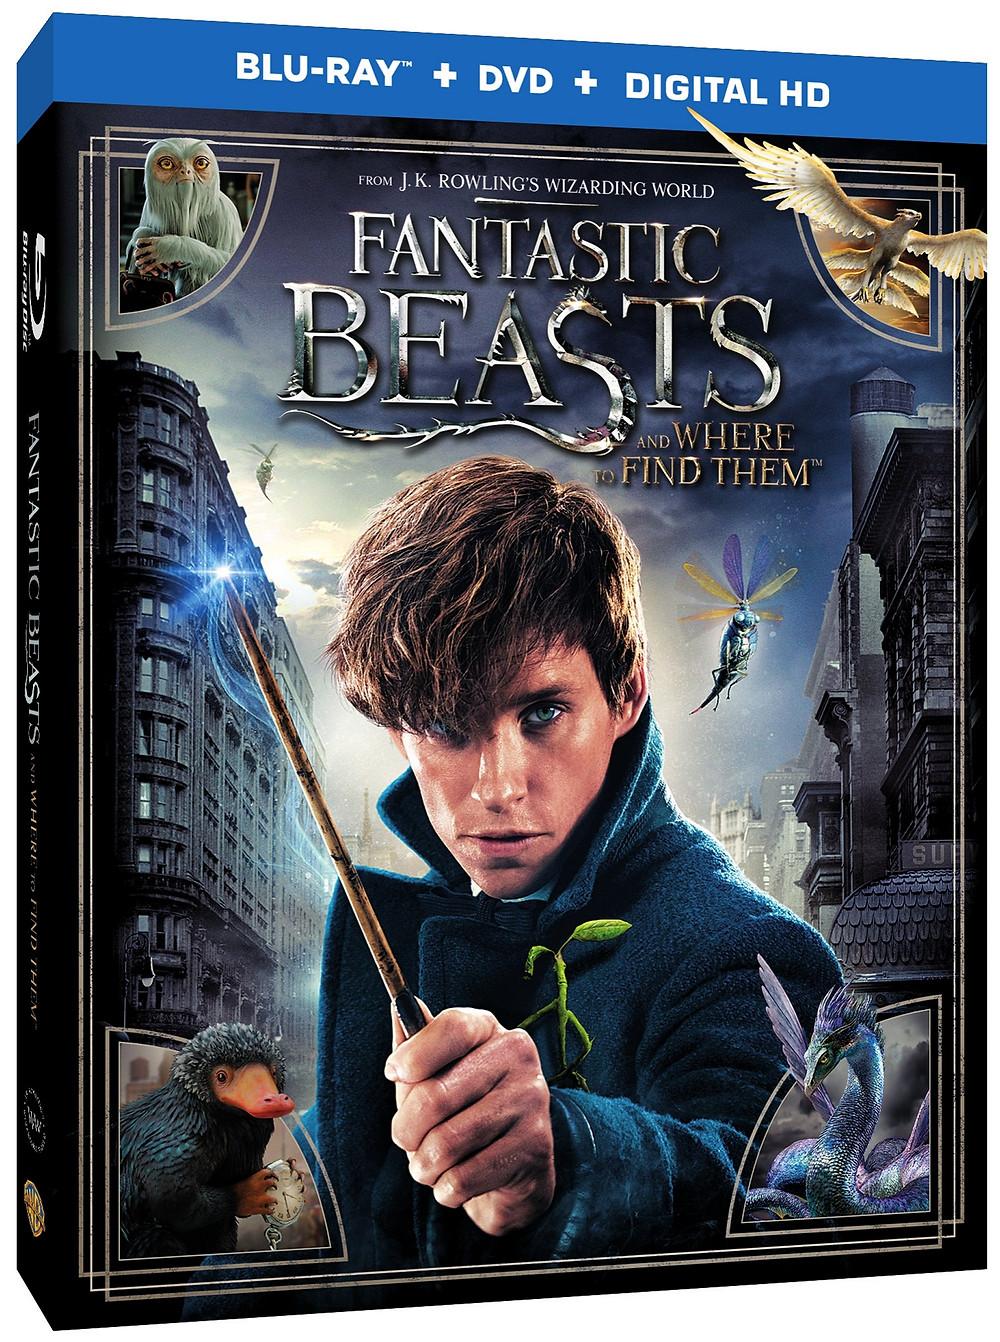 Fantastic Beasts Box Art